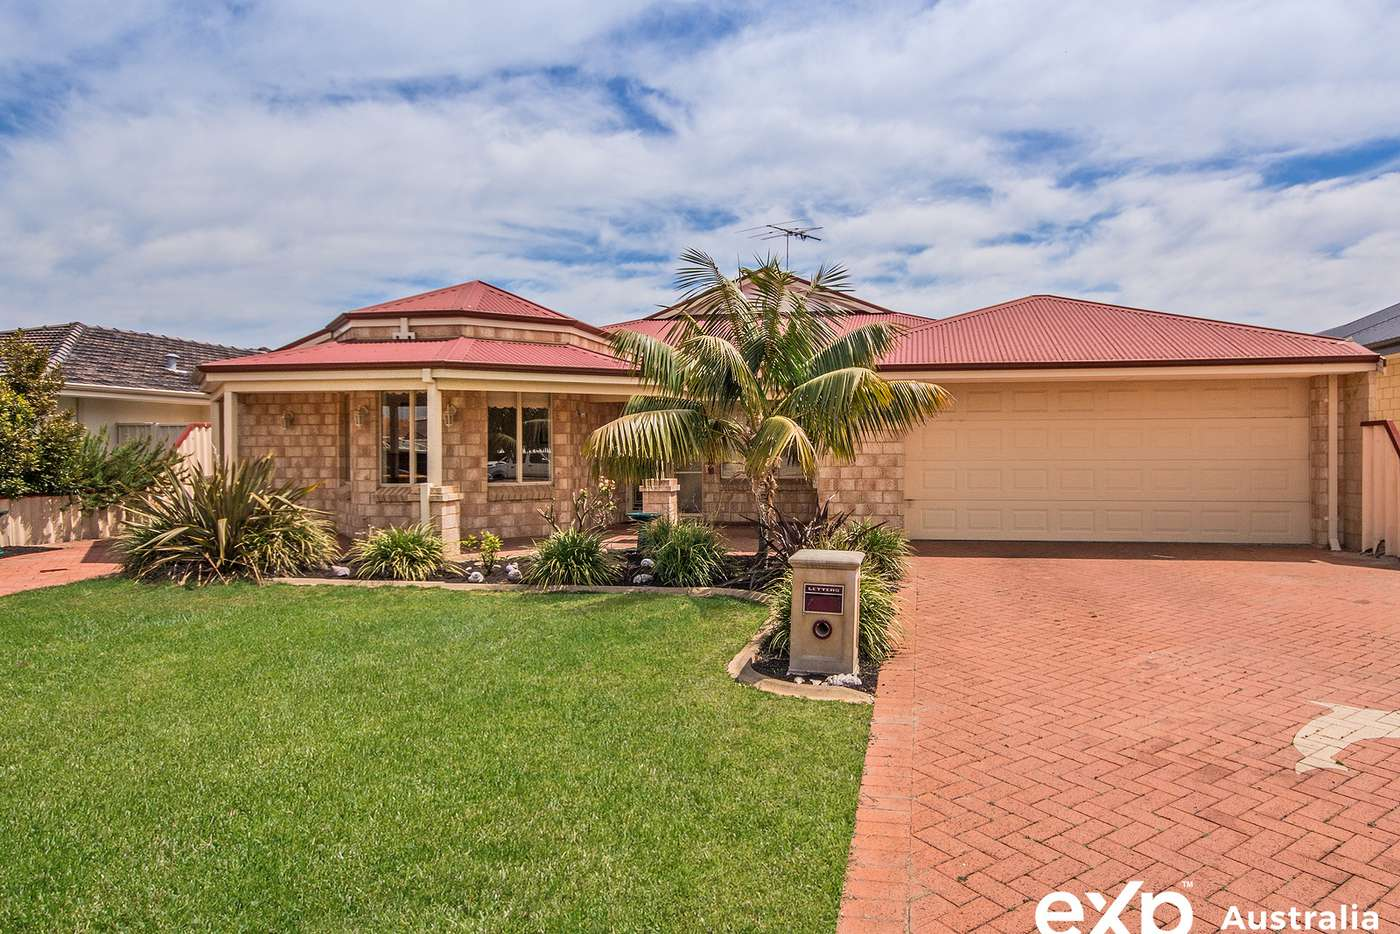 Main view of Homely house listing, 18 Murphy Way, Warnbro WA 6169